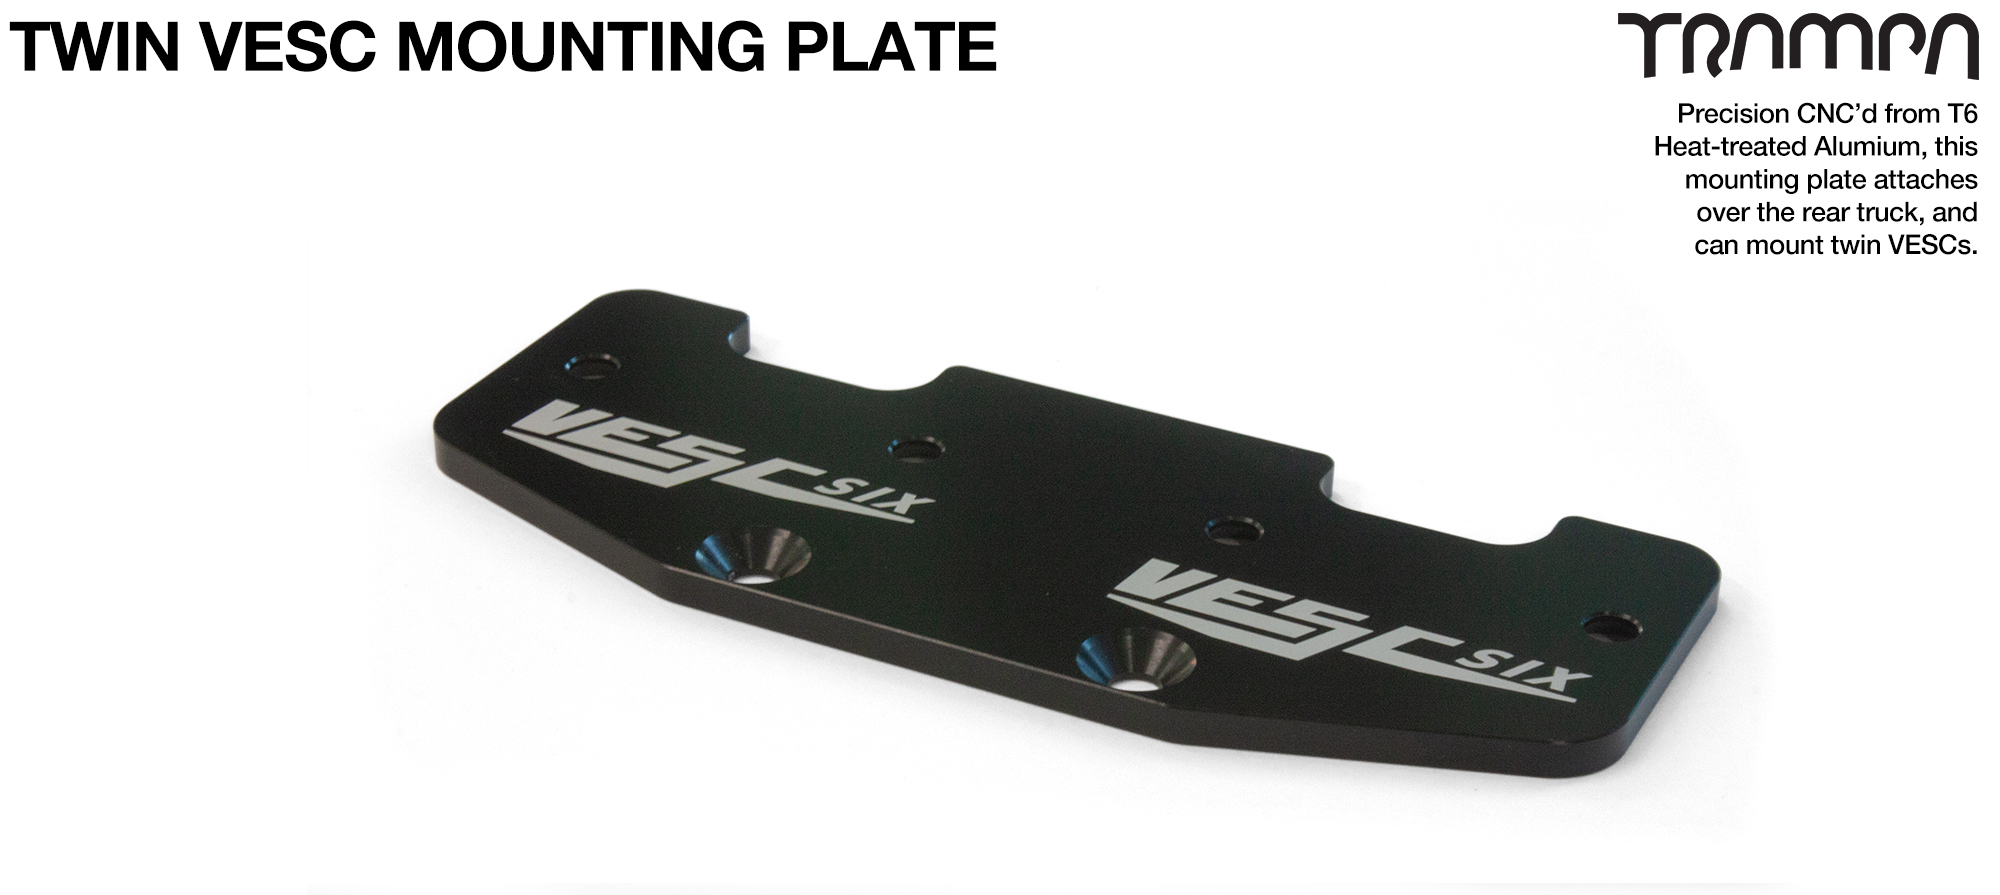 ALUMINIUM mounting Plate for TWIN VESC 6